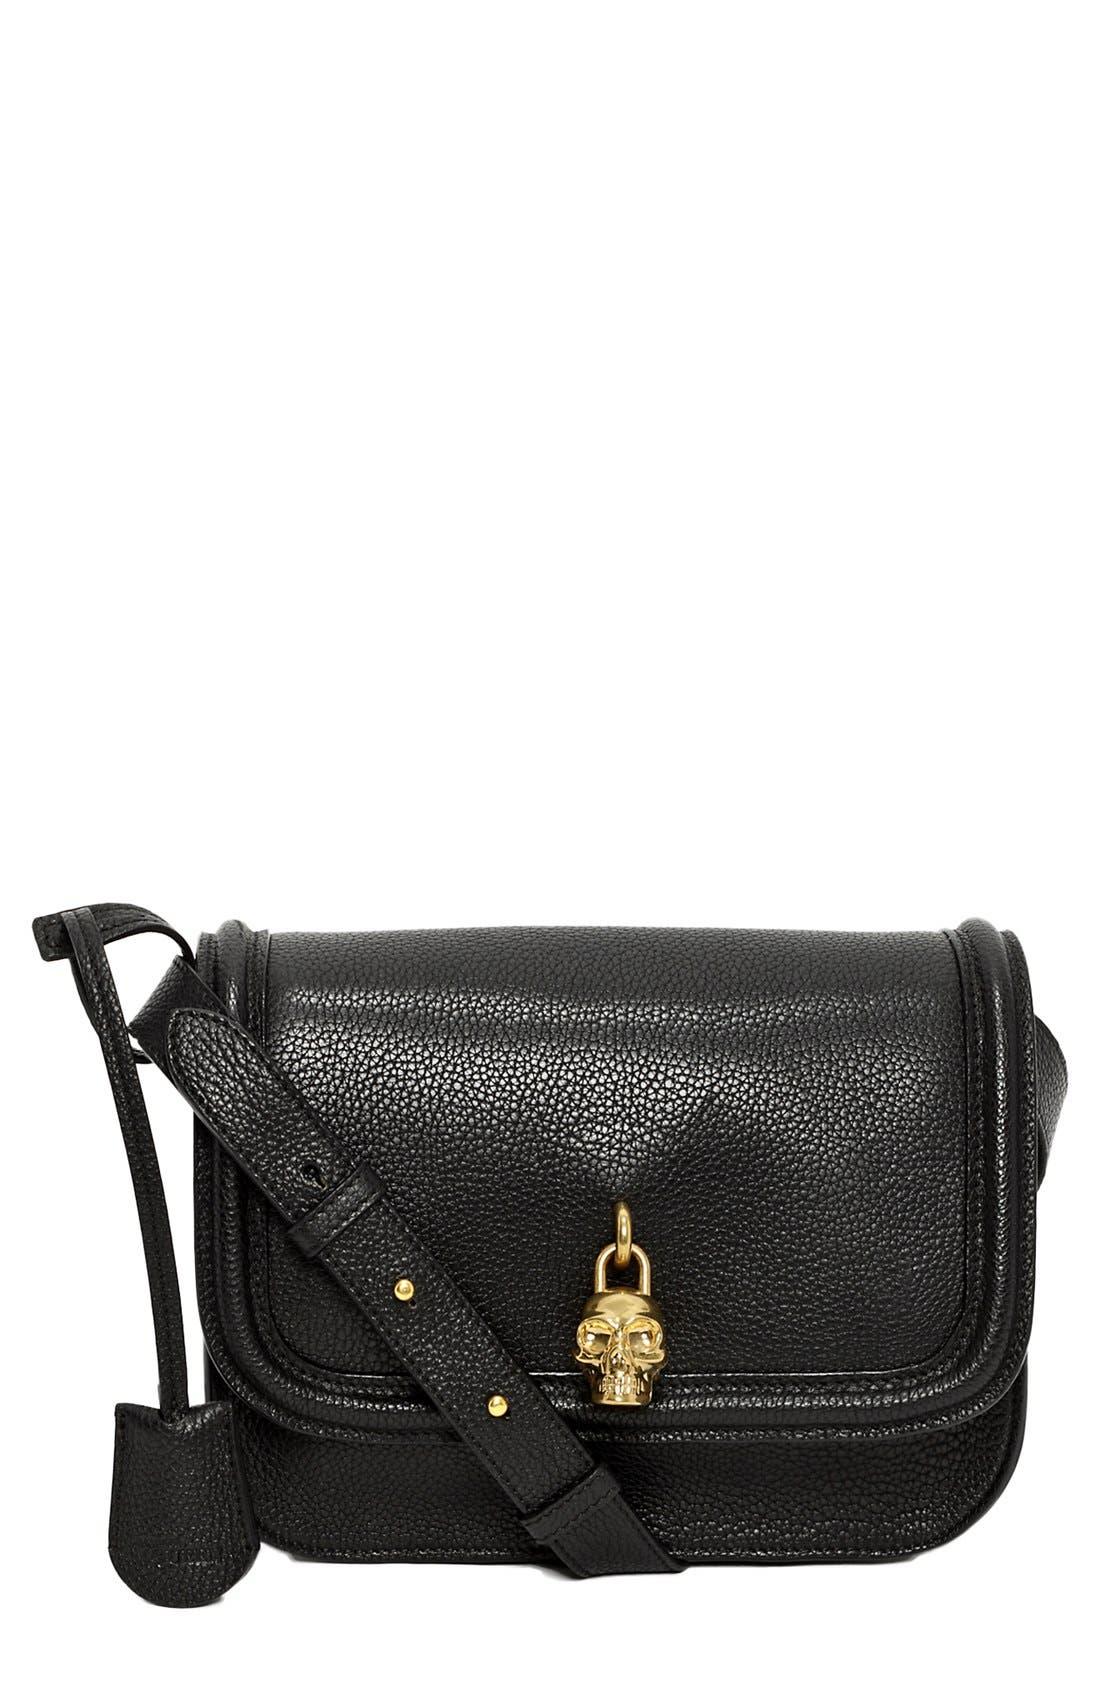 Alternate Image 1 Selected - Alexander McQueen Padlock Flap Calfskin Leather Crossbody Bag